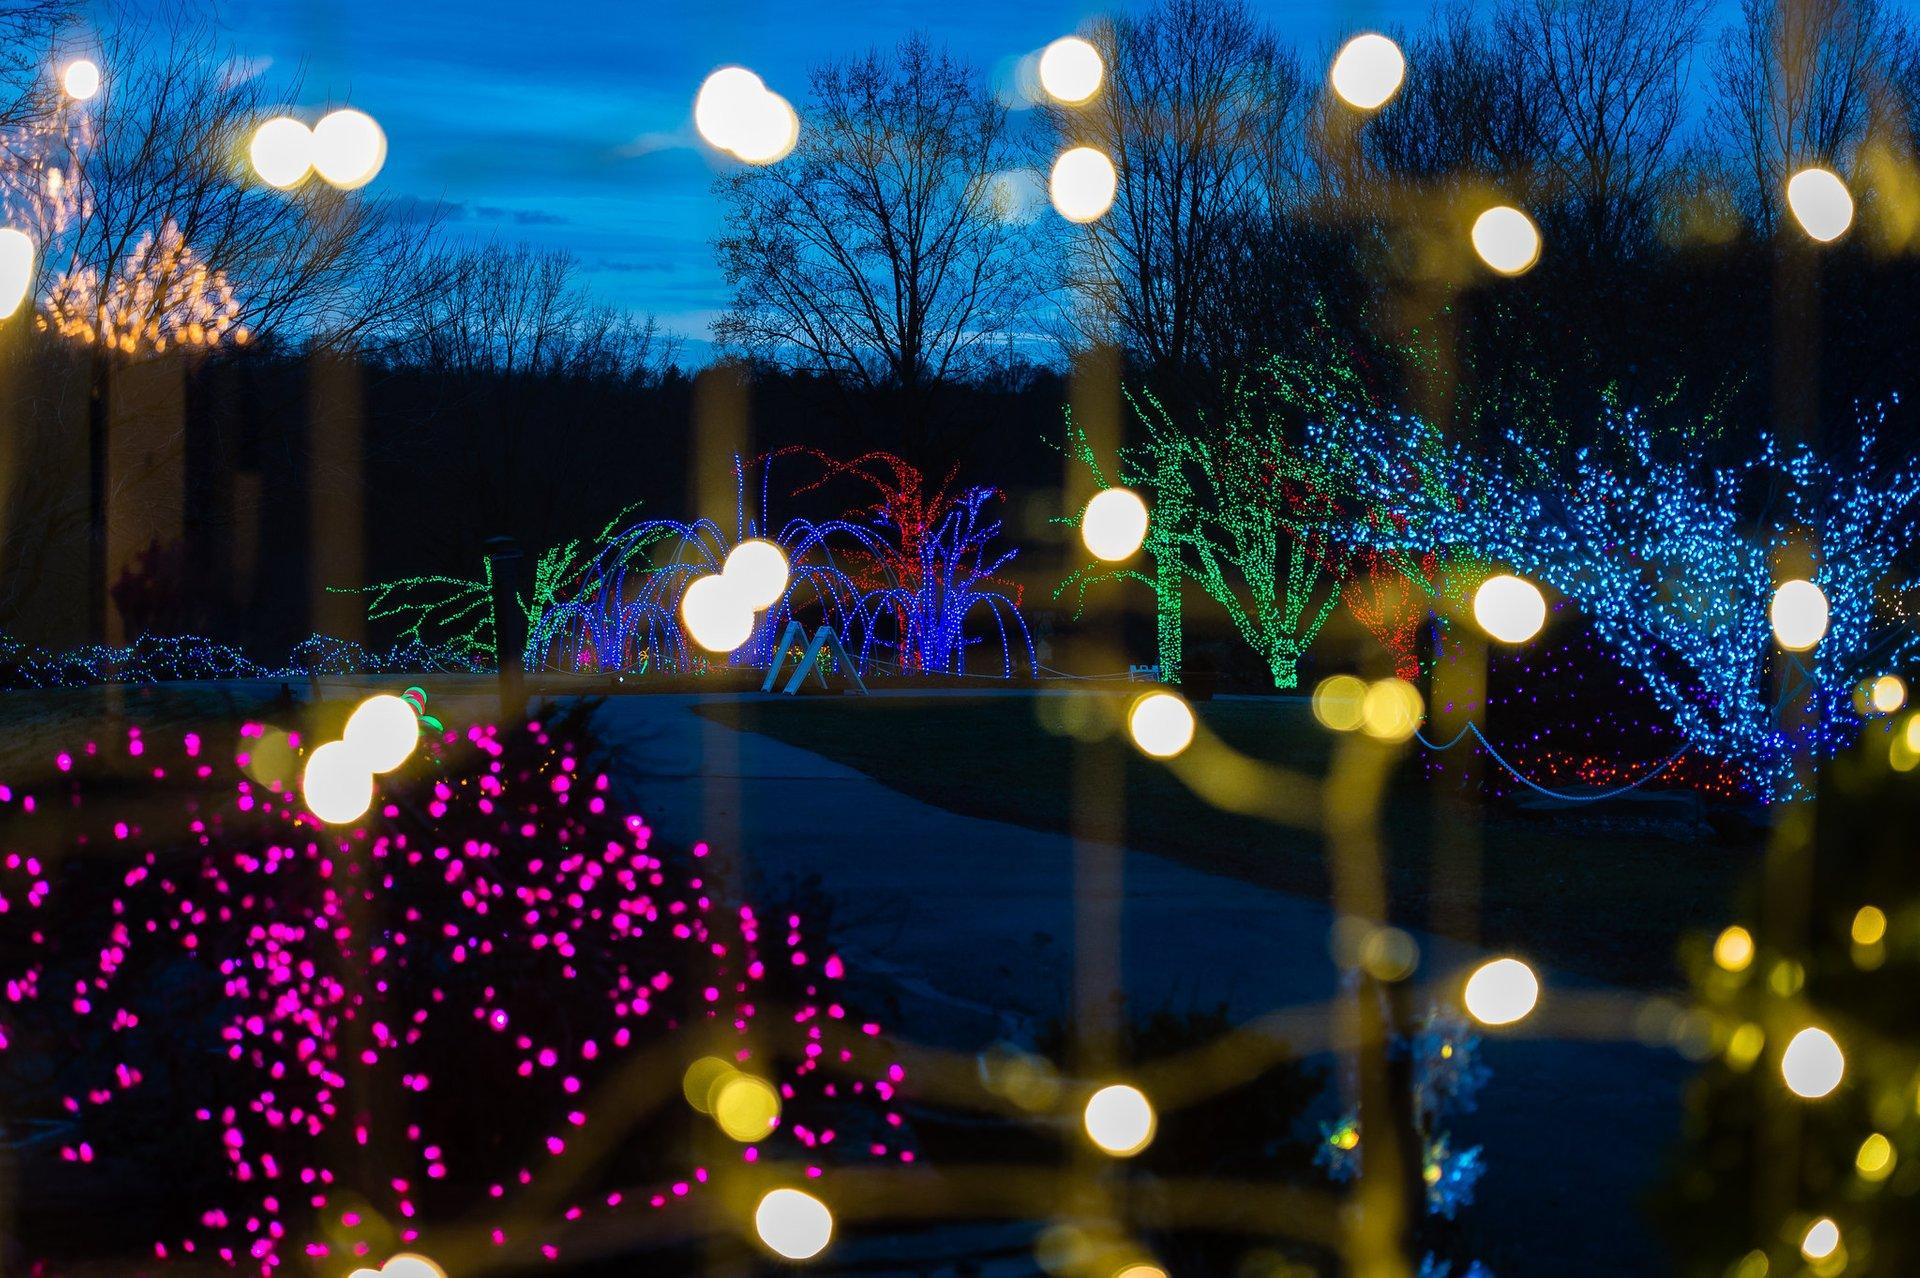 Meadowlark Botanical Gardens at the Holidays 2020